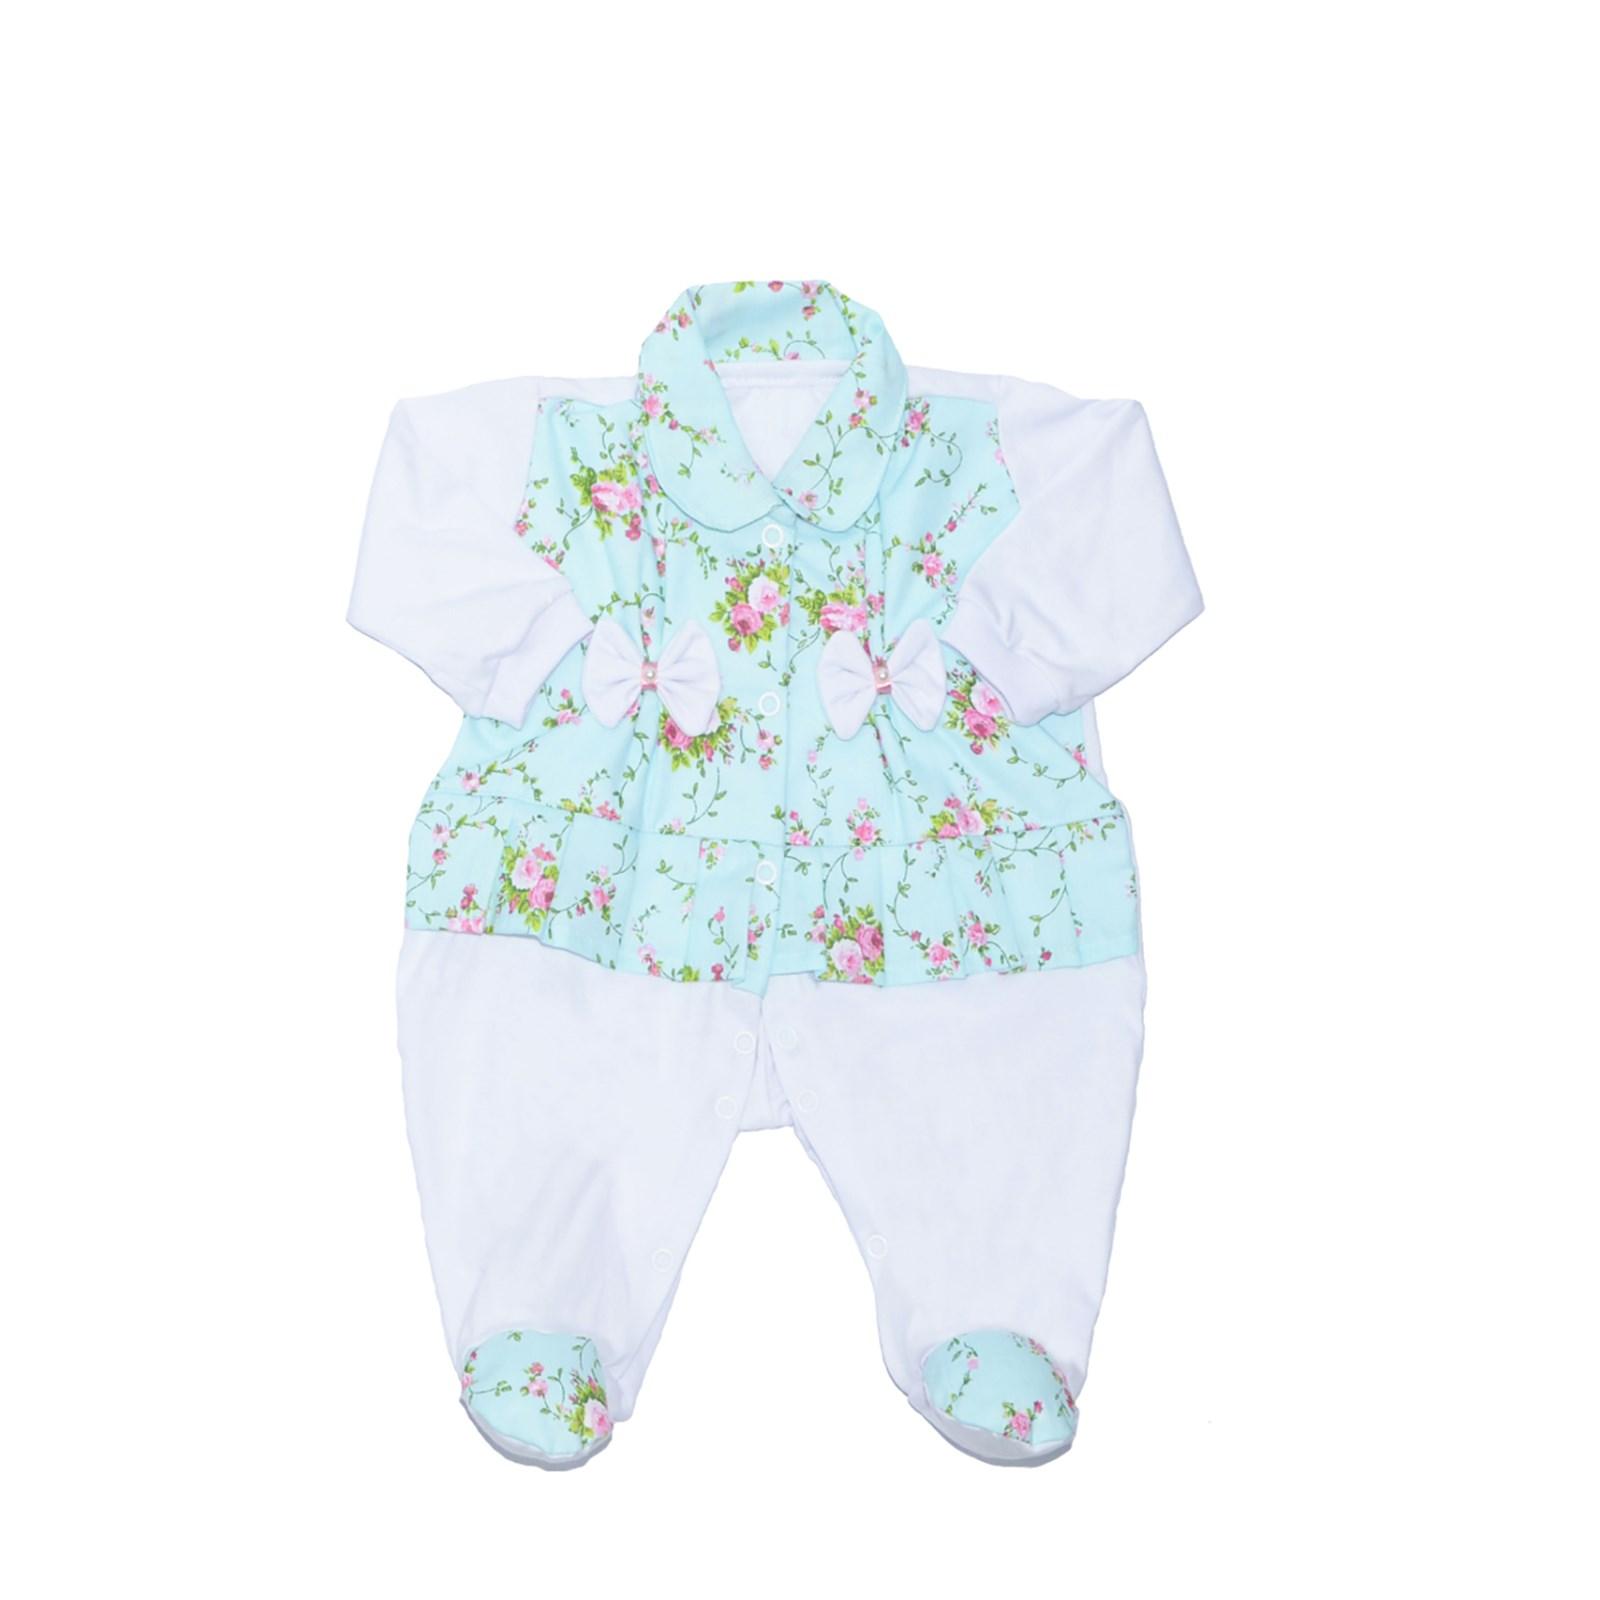 4fc9f35285 Macacão Manga Longa Bebê Menina Sofia Branco - P